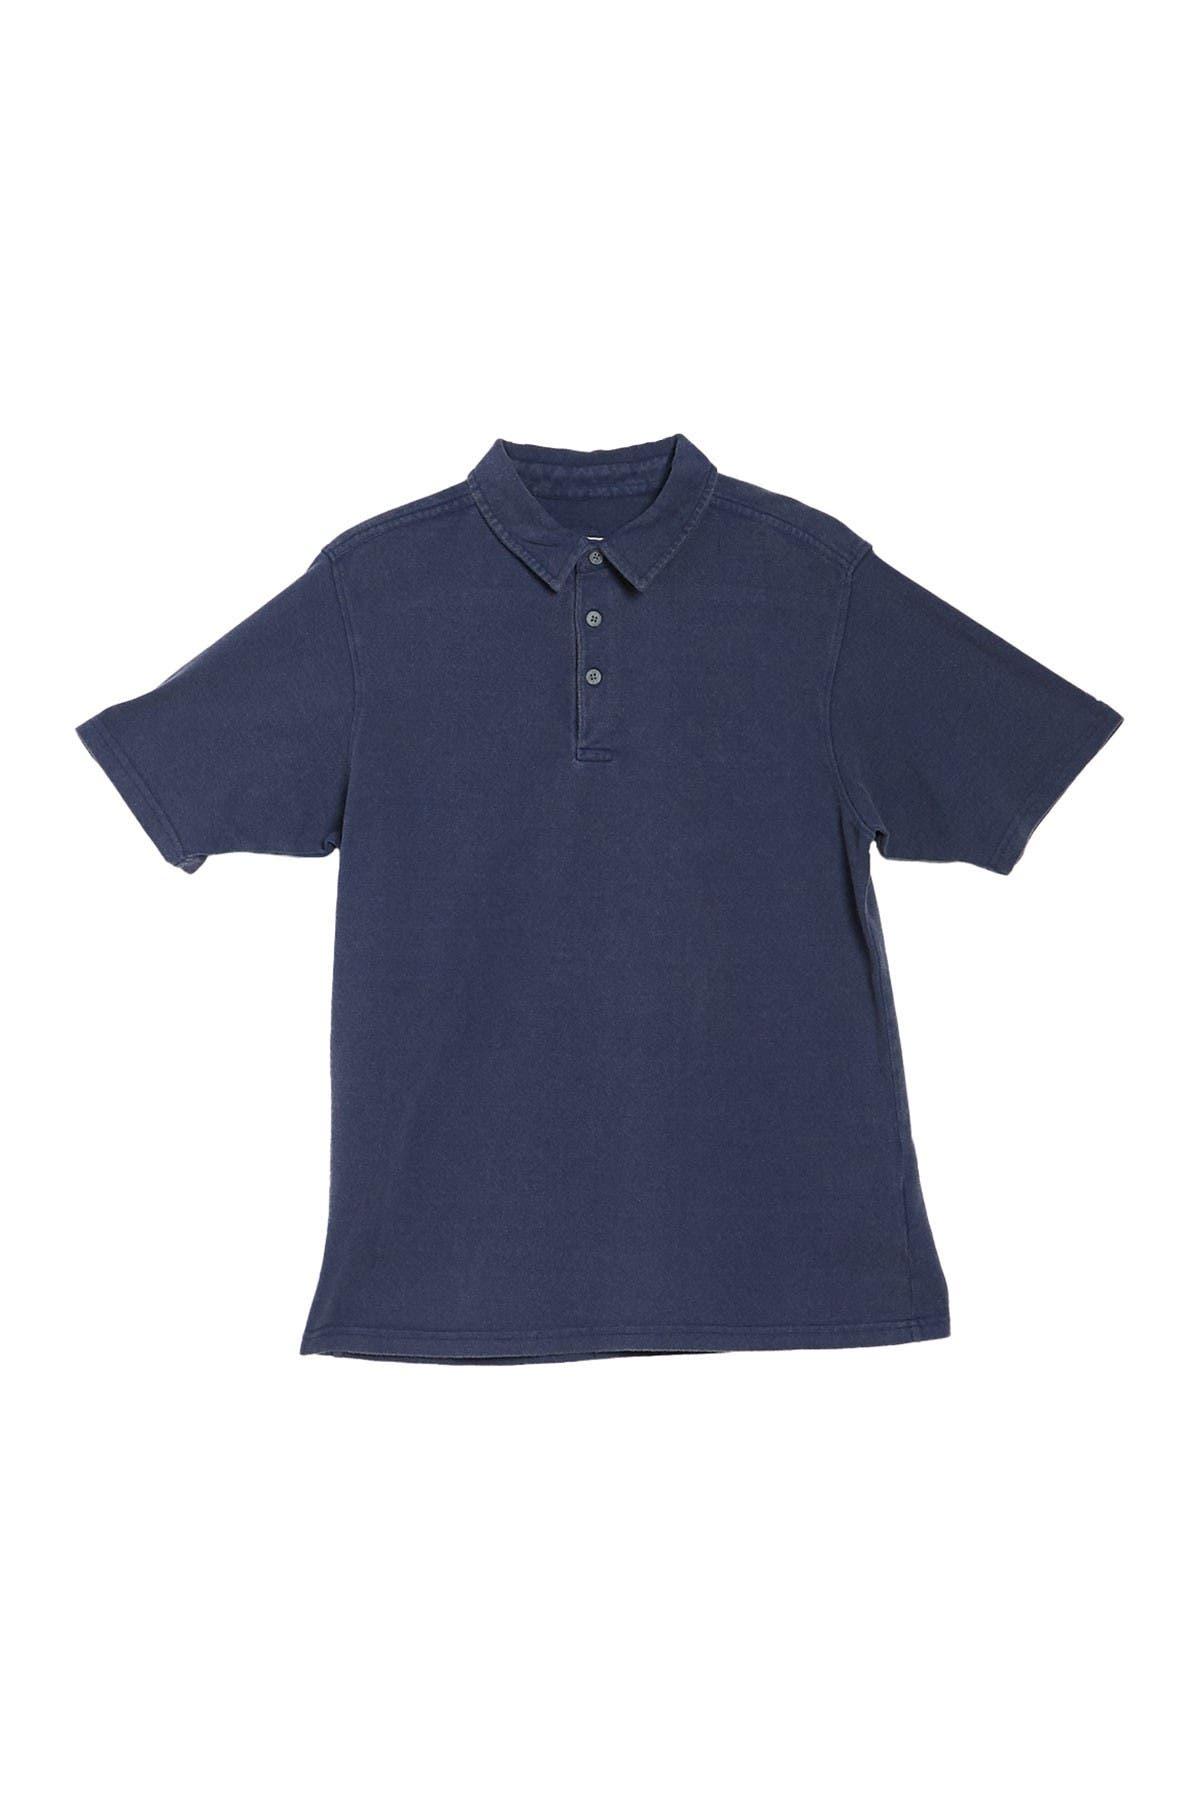 Image of COASTAORO Indy Pique Knit Short Sleeve Polo